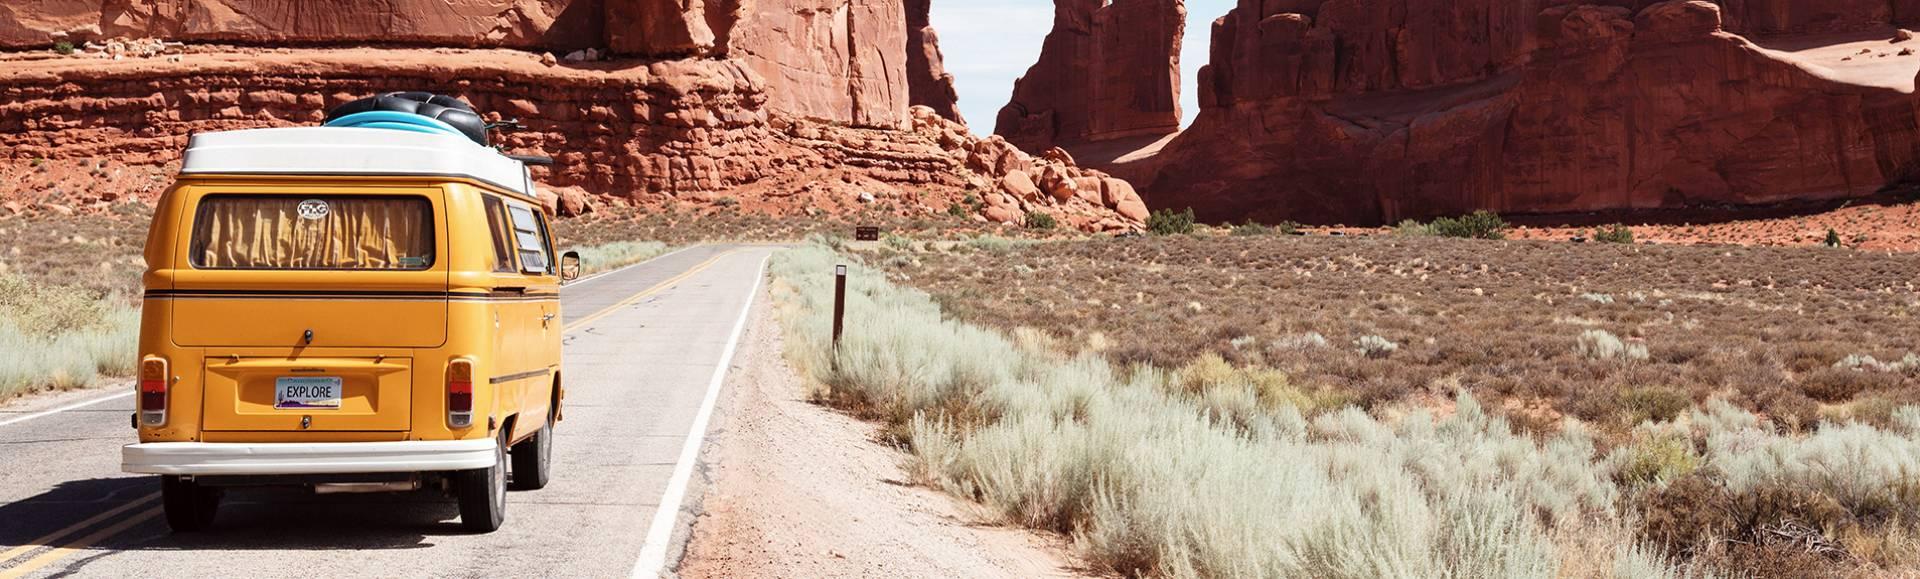 van-vintage-jaune-grand-canyon.jpg